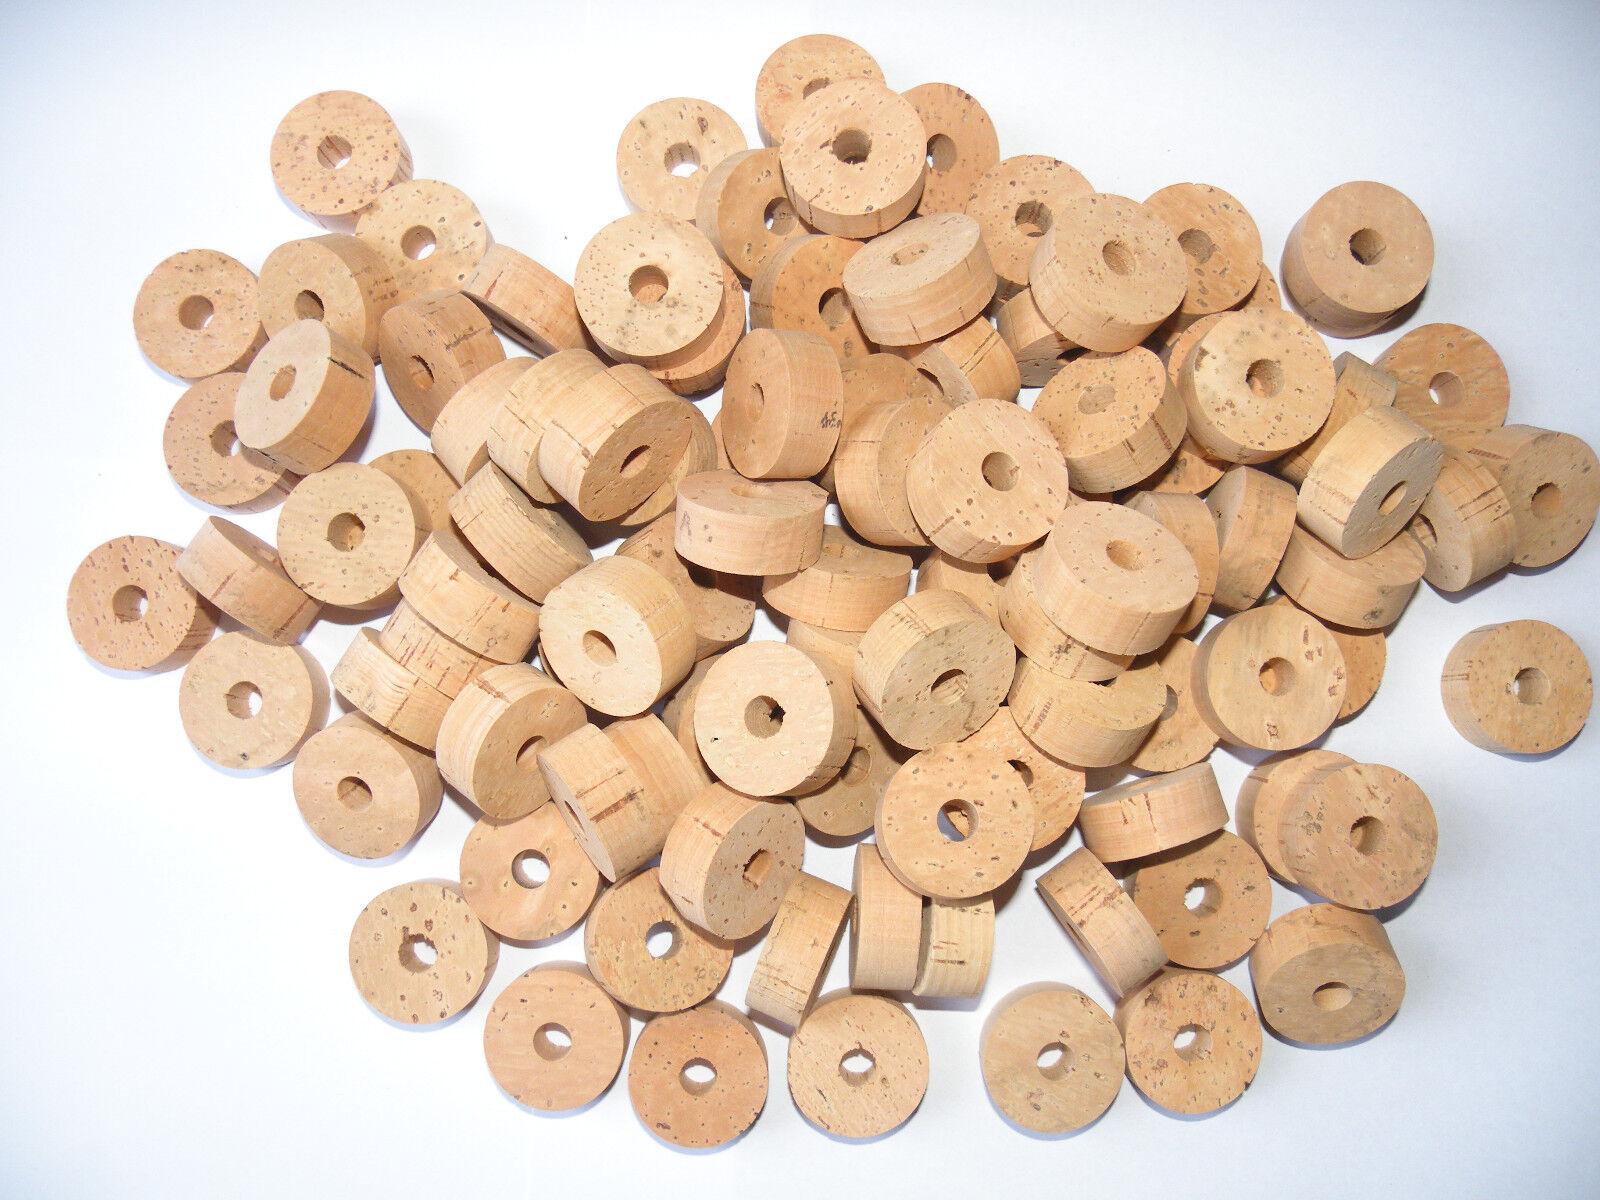 100 Anillos de corcho de grado extra de diámetro de 11 4 X1 2  5 16  (8 mm) -  envío Gratis